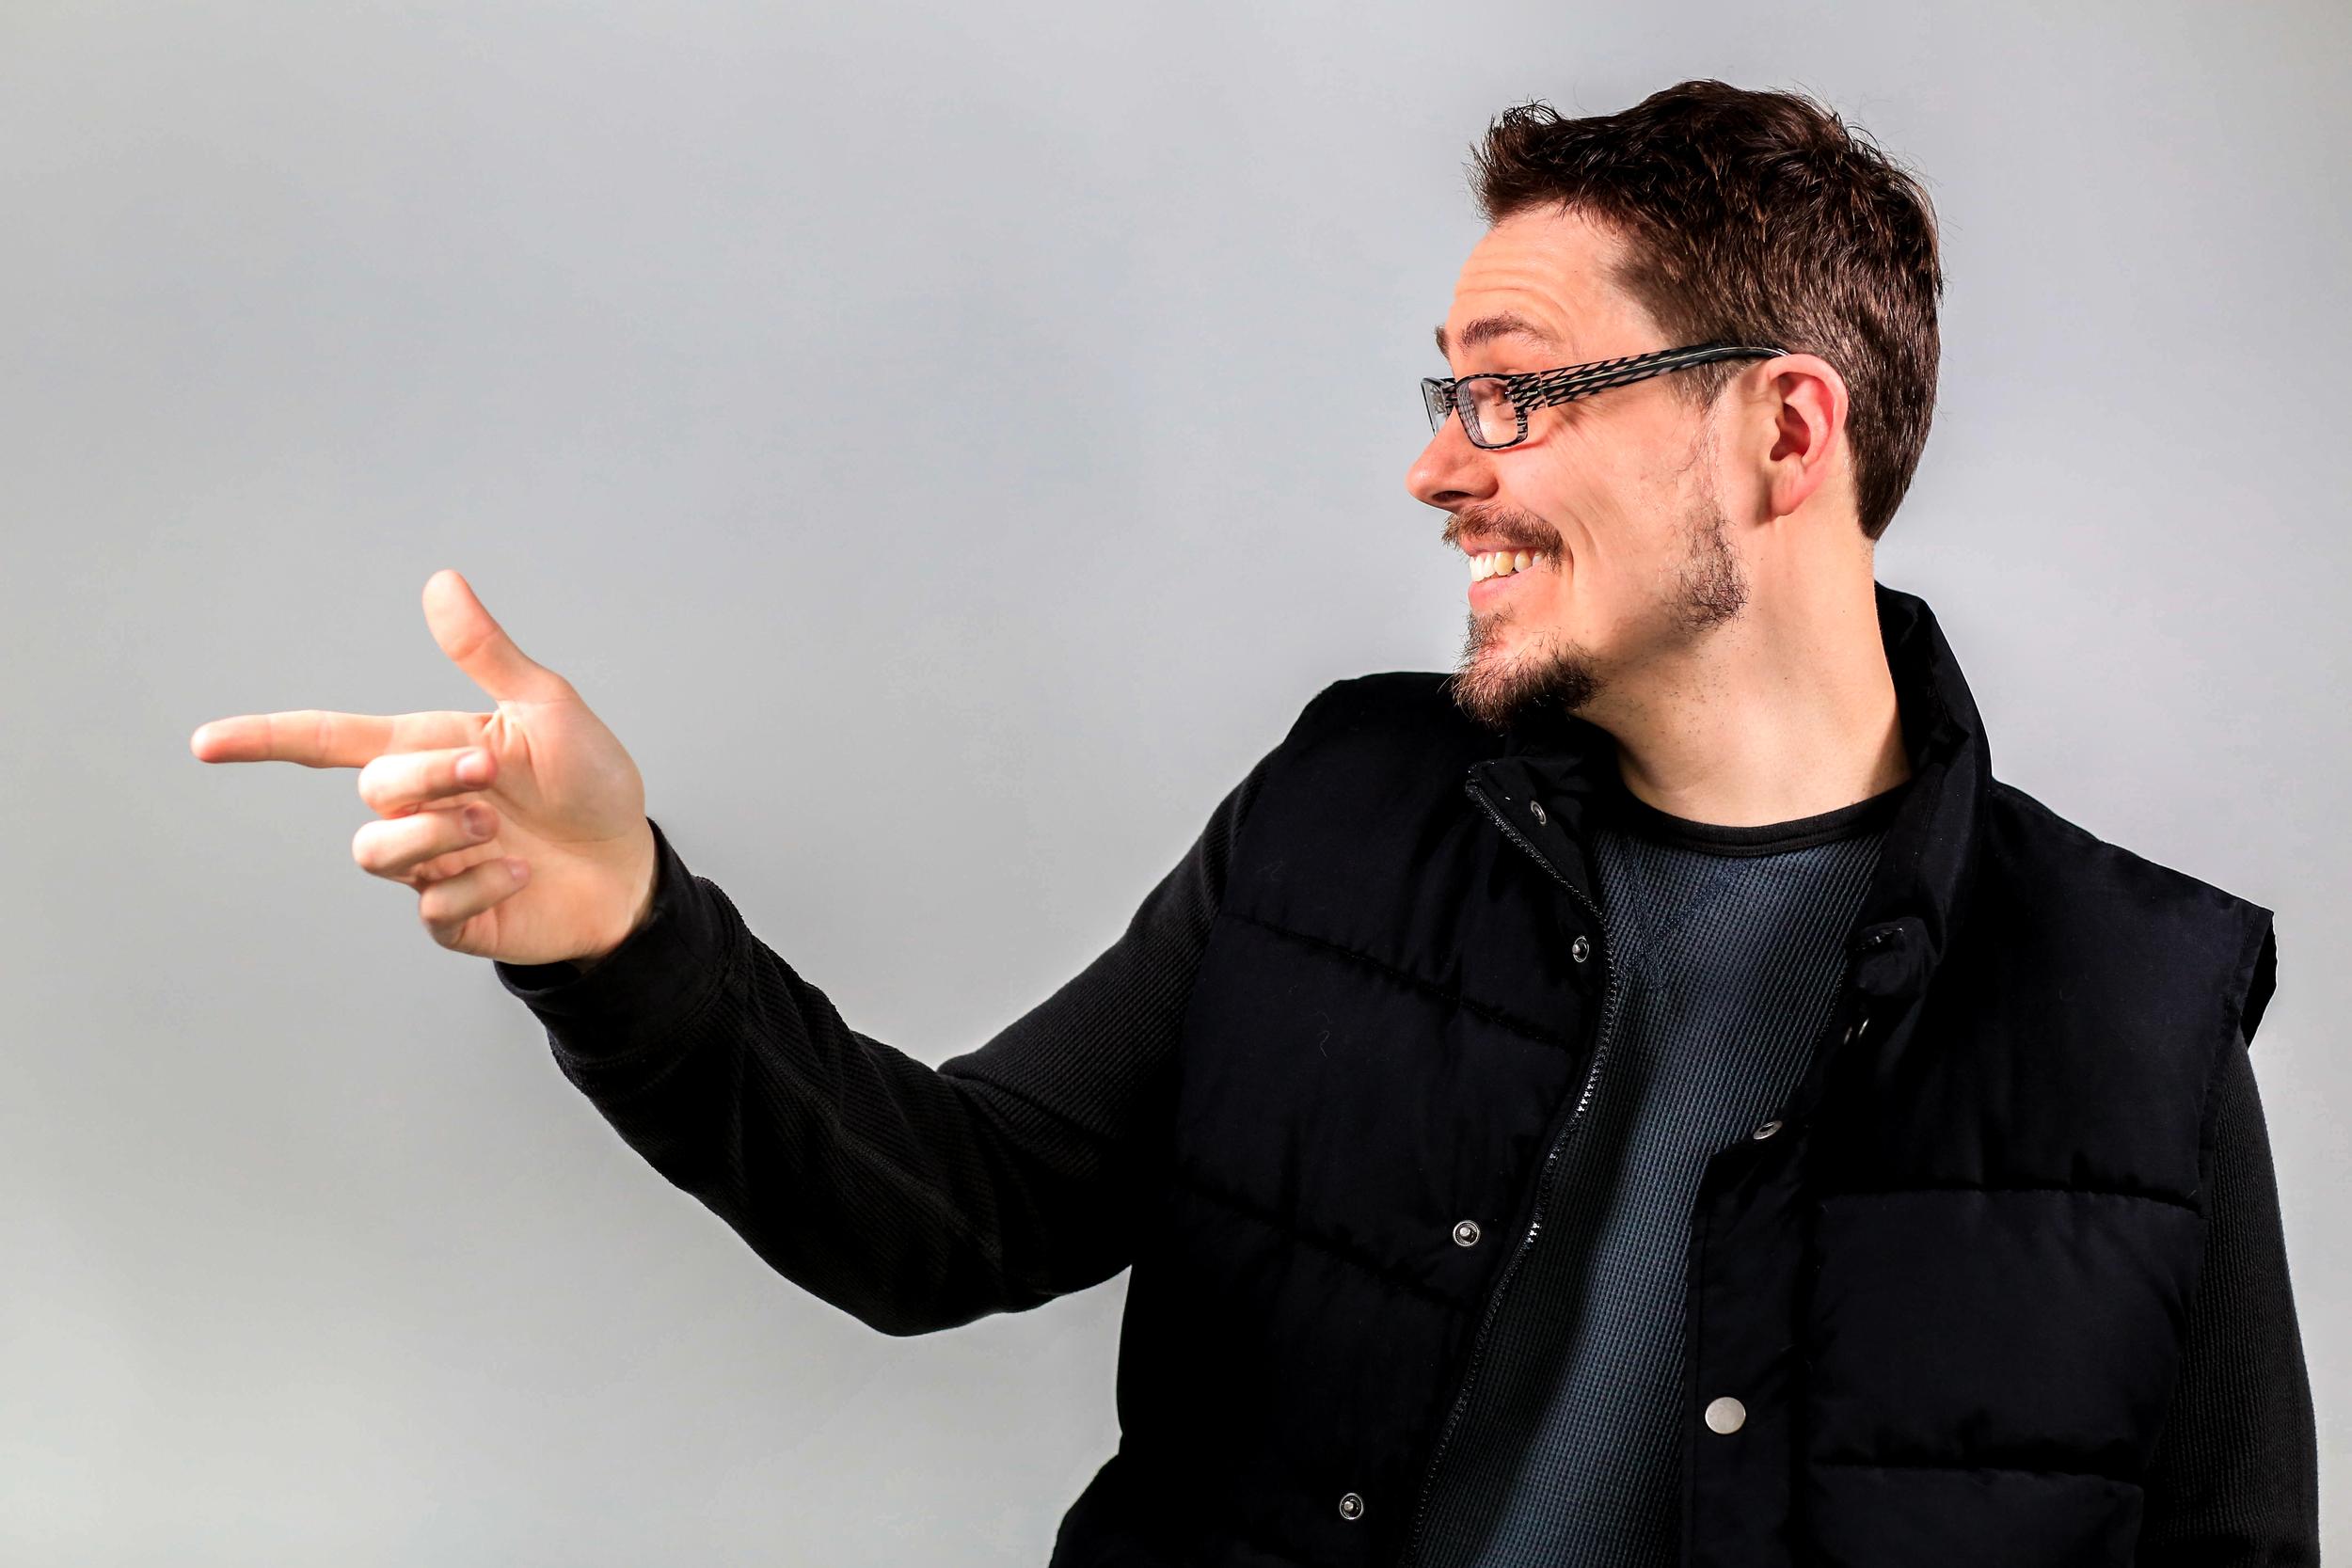 Josh isn't pointing. He's just waving.